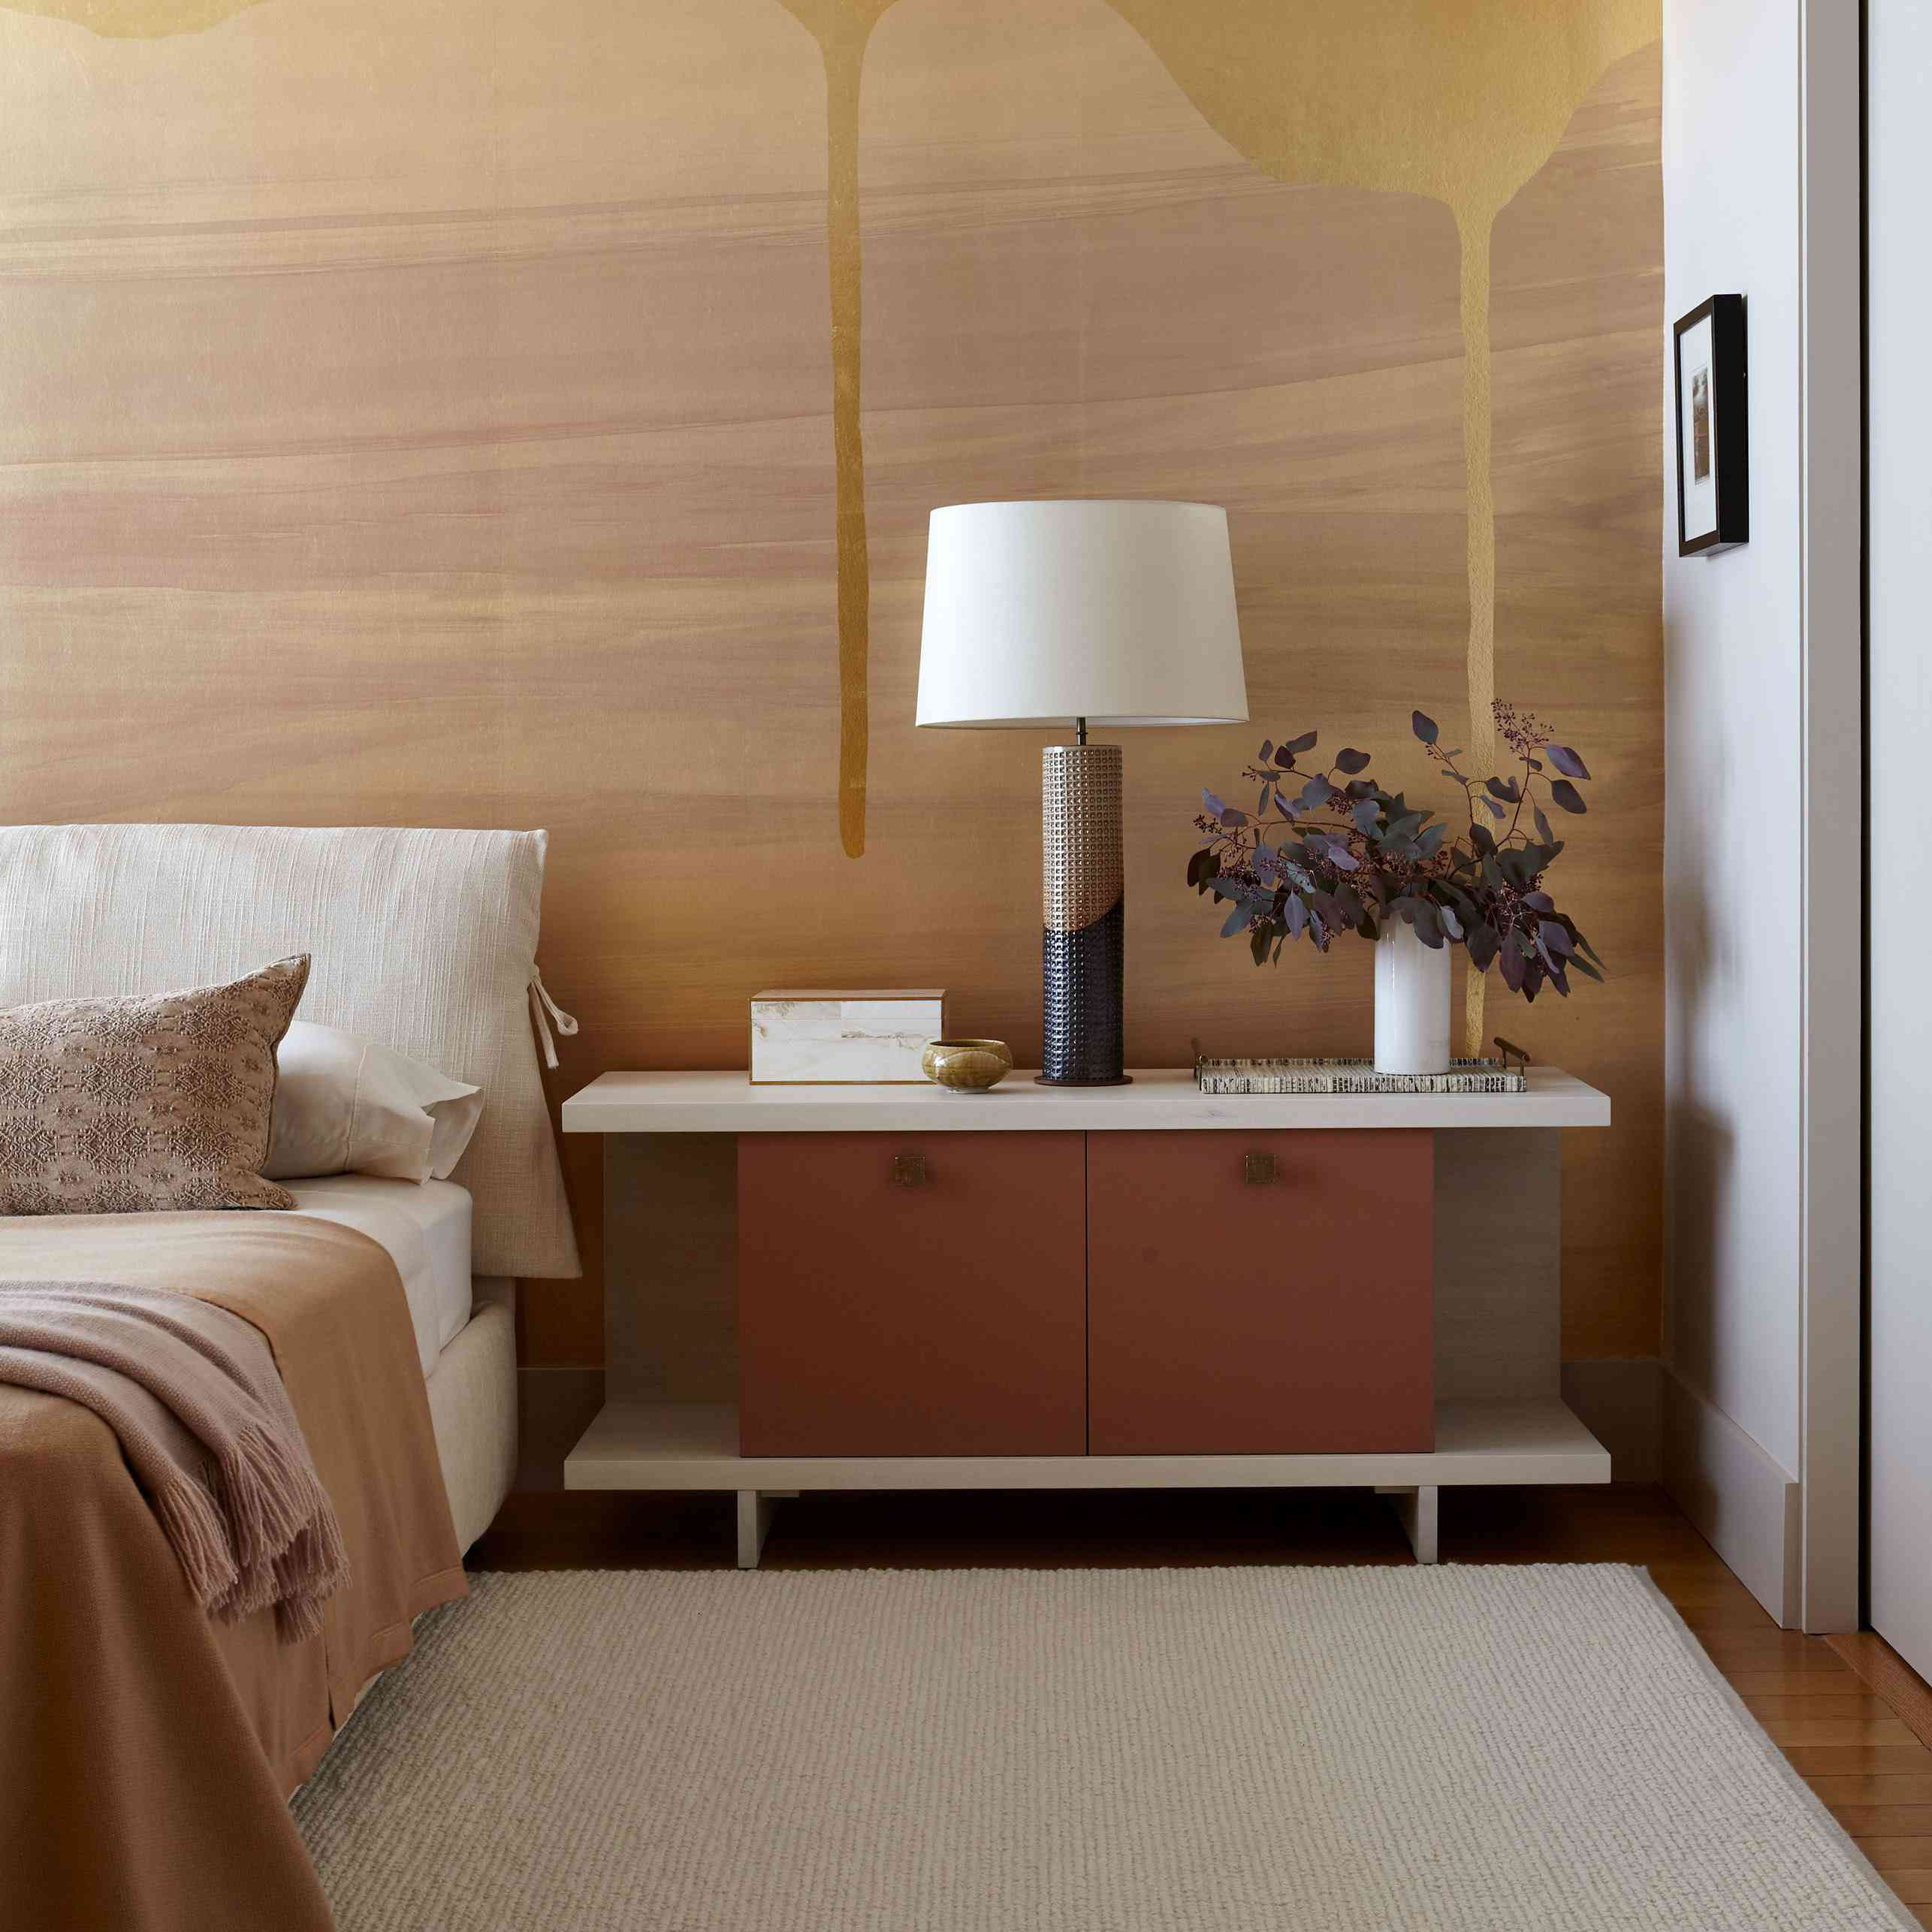 Side table lamp in bedroom.